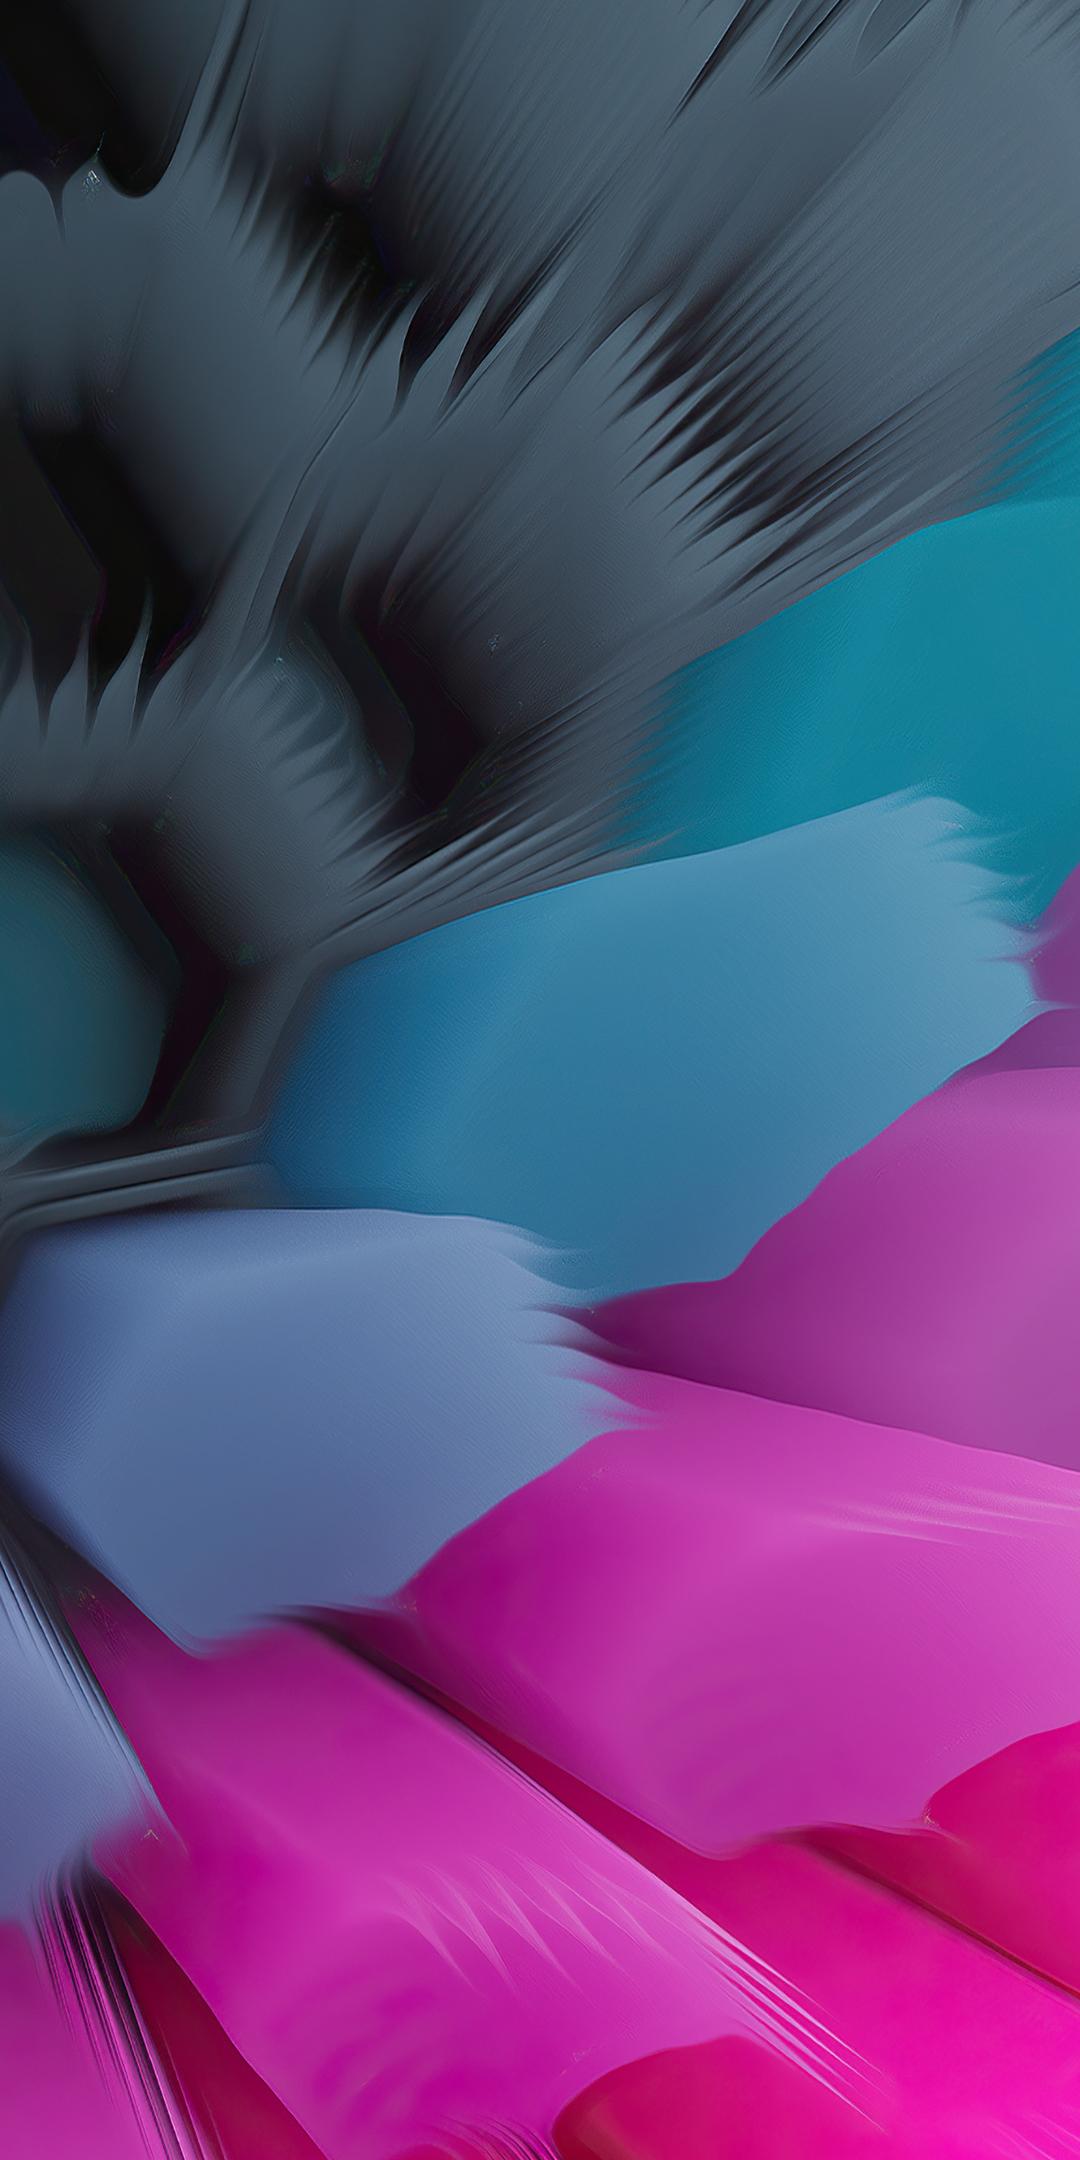 Pink Blue 4K Hexagon Wallpaper in 1080x2160 Resolution